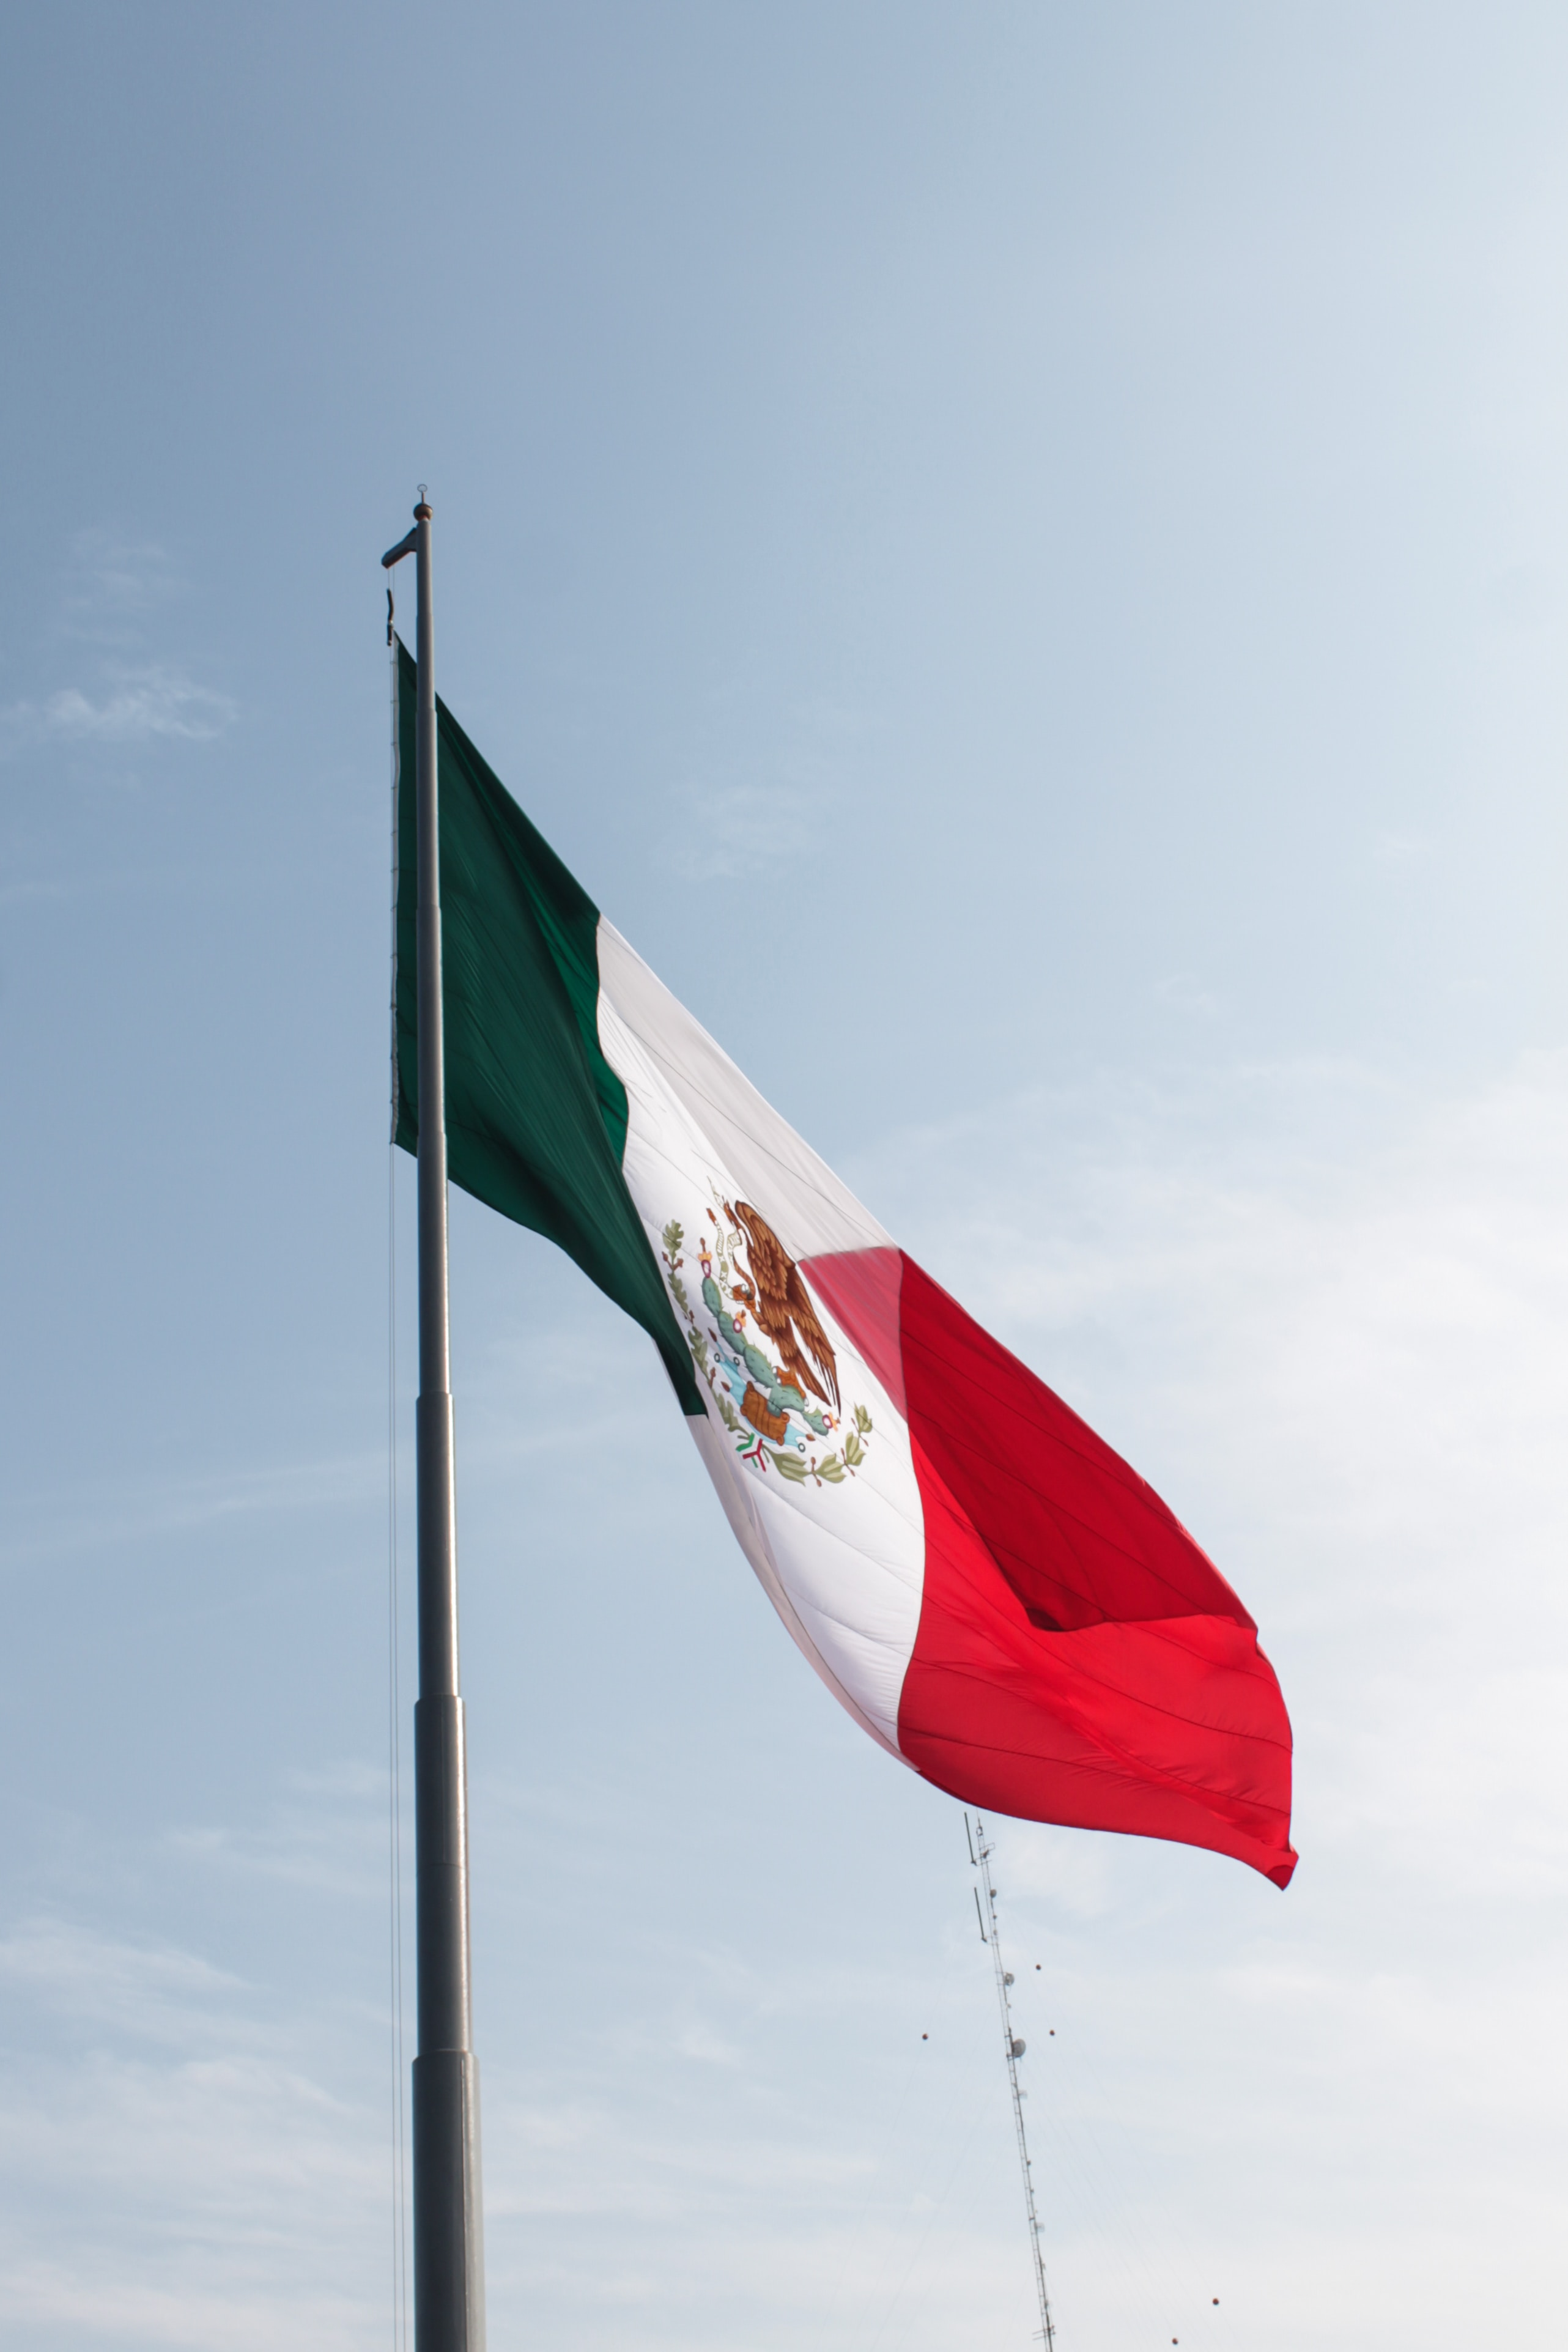 Khiron Participates in Mexican Senate Cannabis Regulation Forum